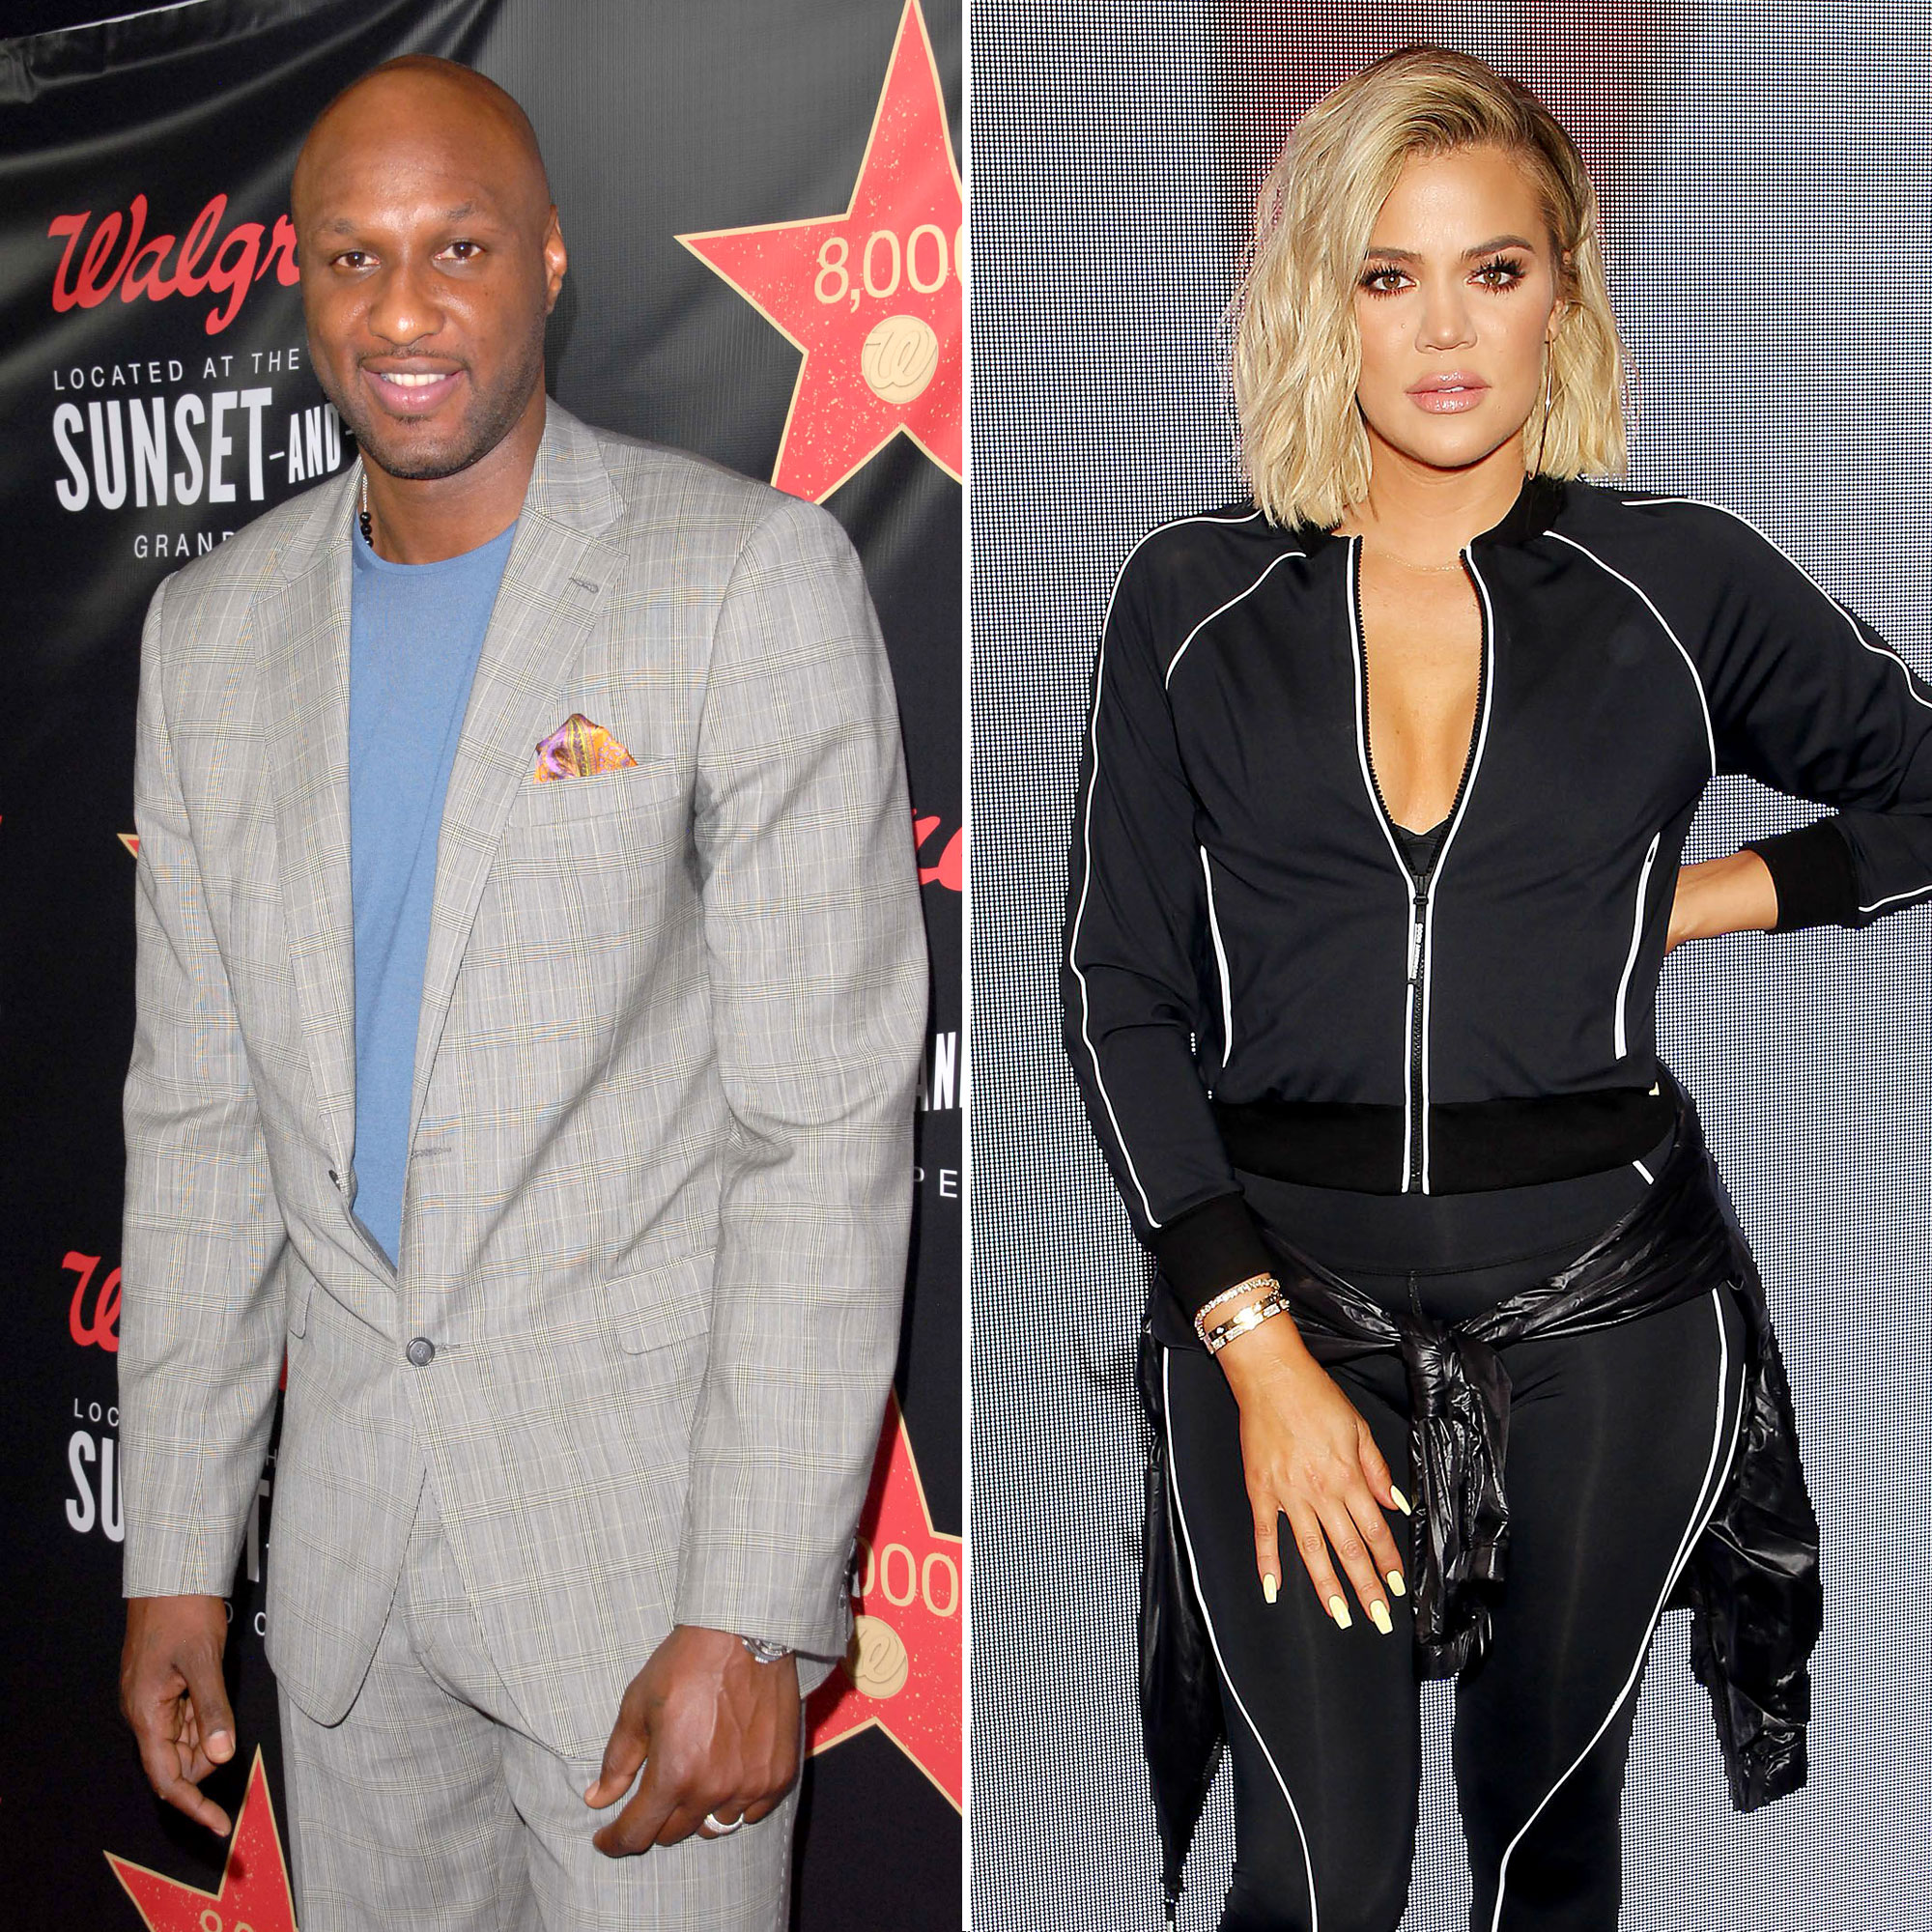 Lamar Odom Wished He Bumped Into Ex-Wife Khloe Kardashian at Hyde Lounge